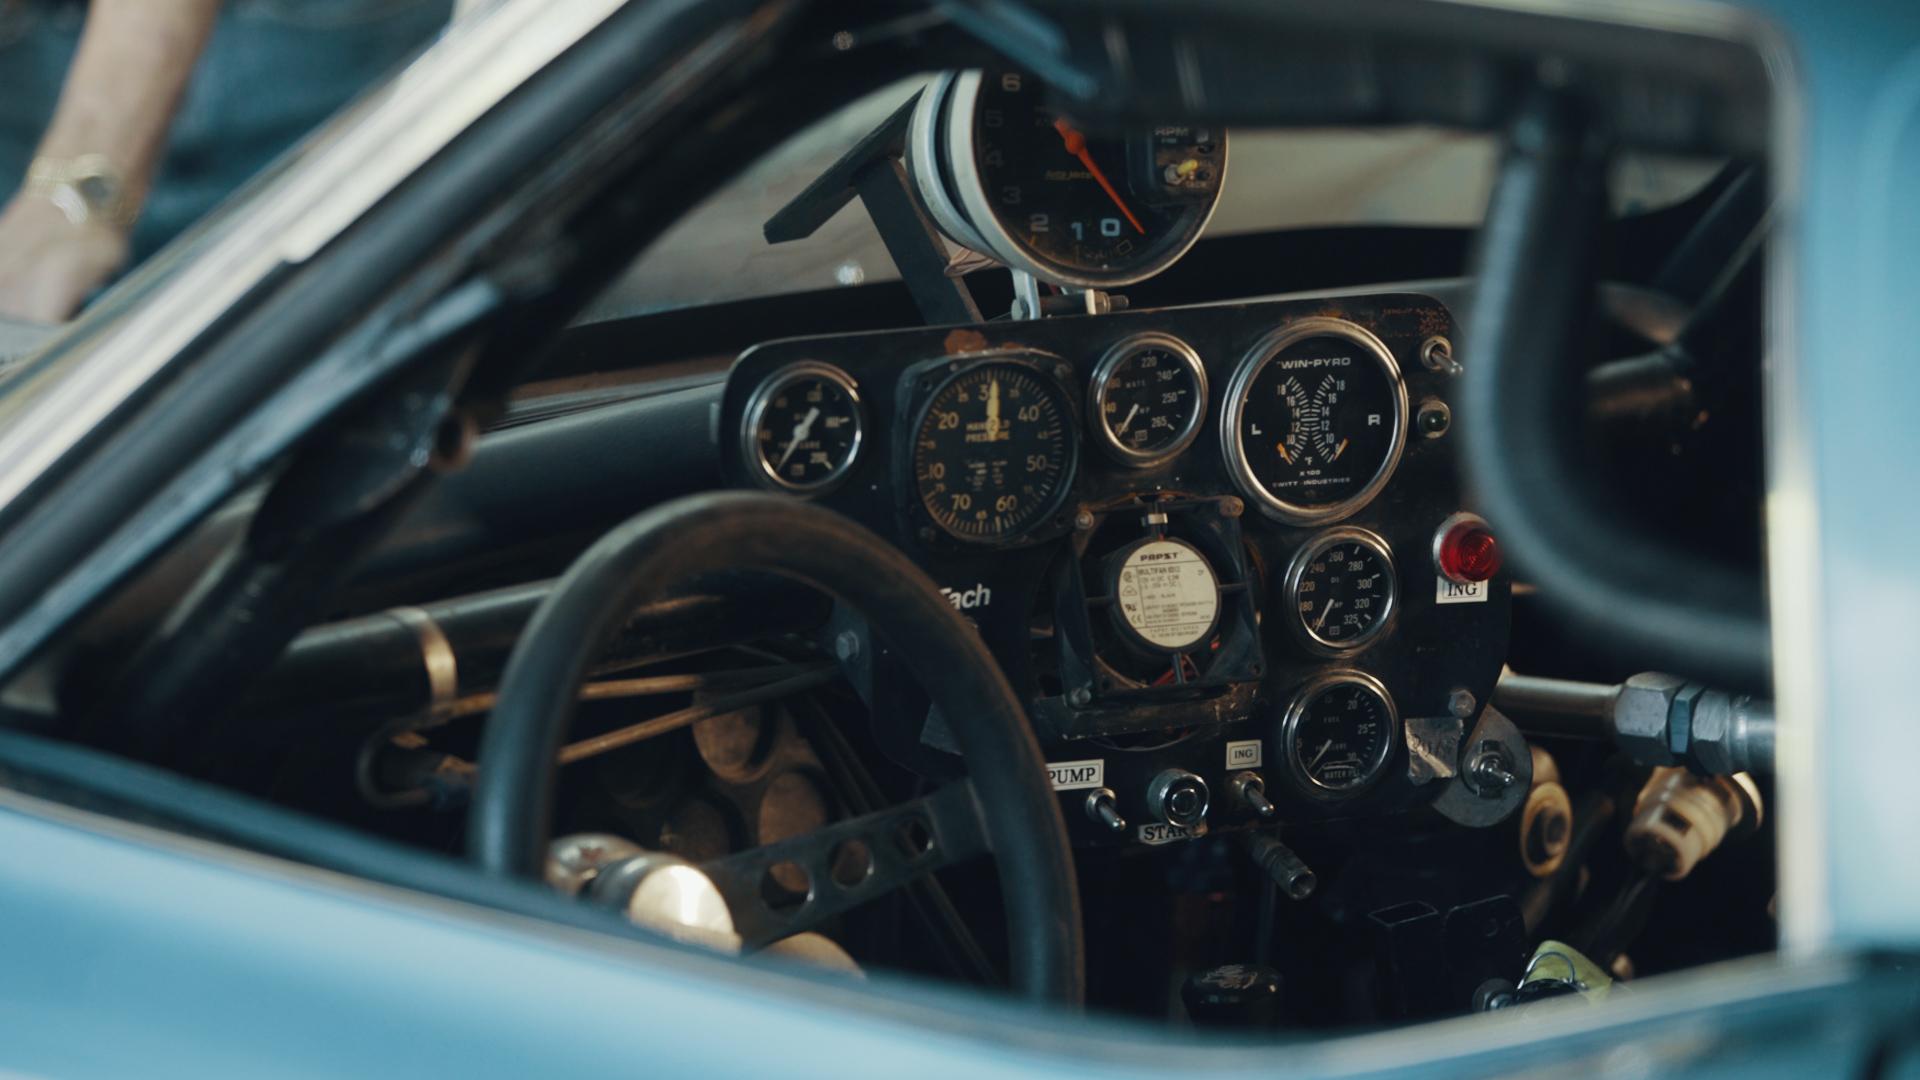 Bonneville_The_Worlds_Fastest_Doc_Film_Moto-Mucci (3).jpg